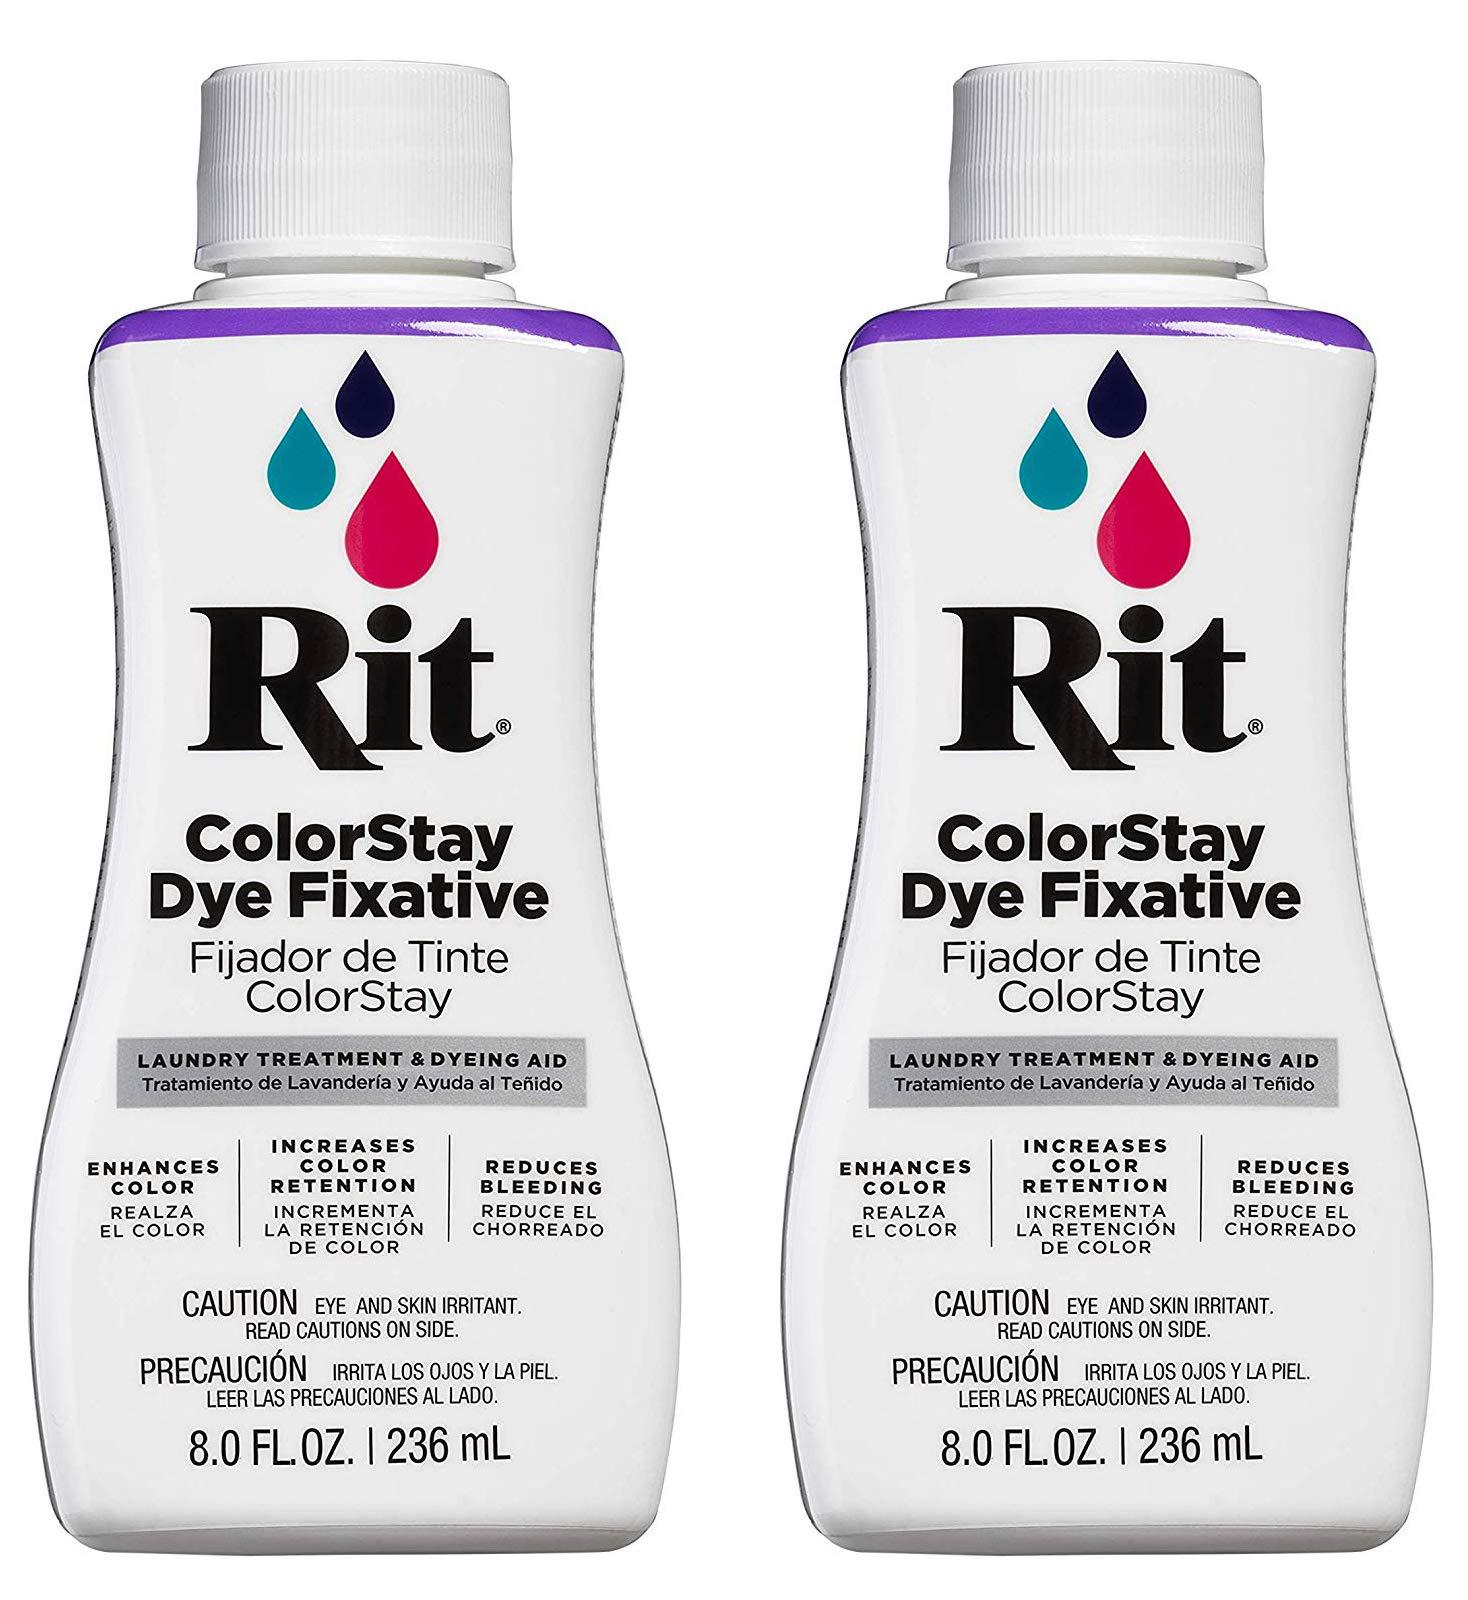 Rit ColorStay Dye Fixative. 2-Pack